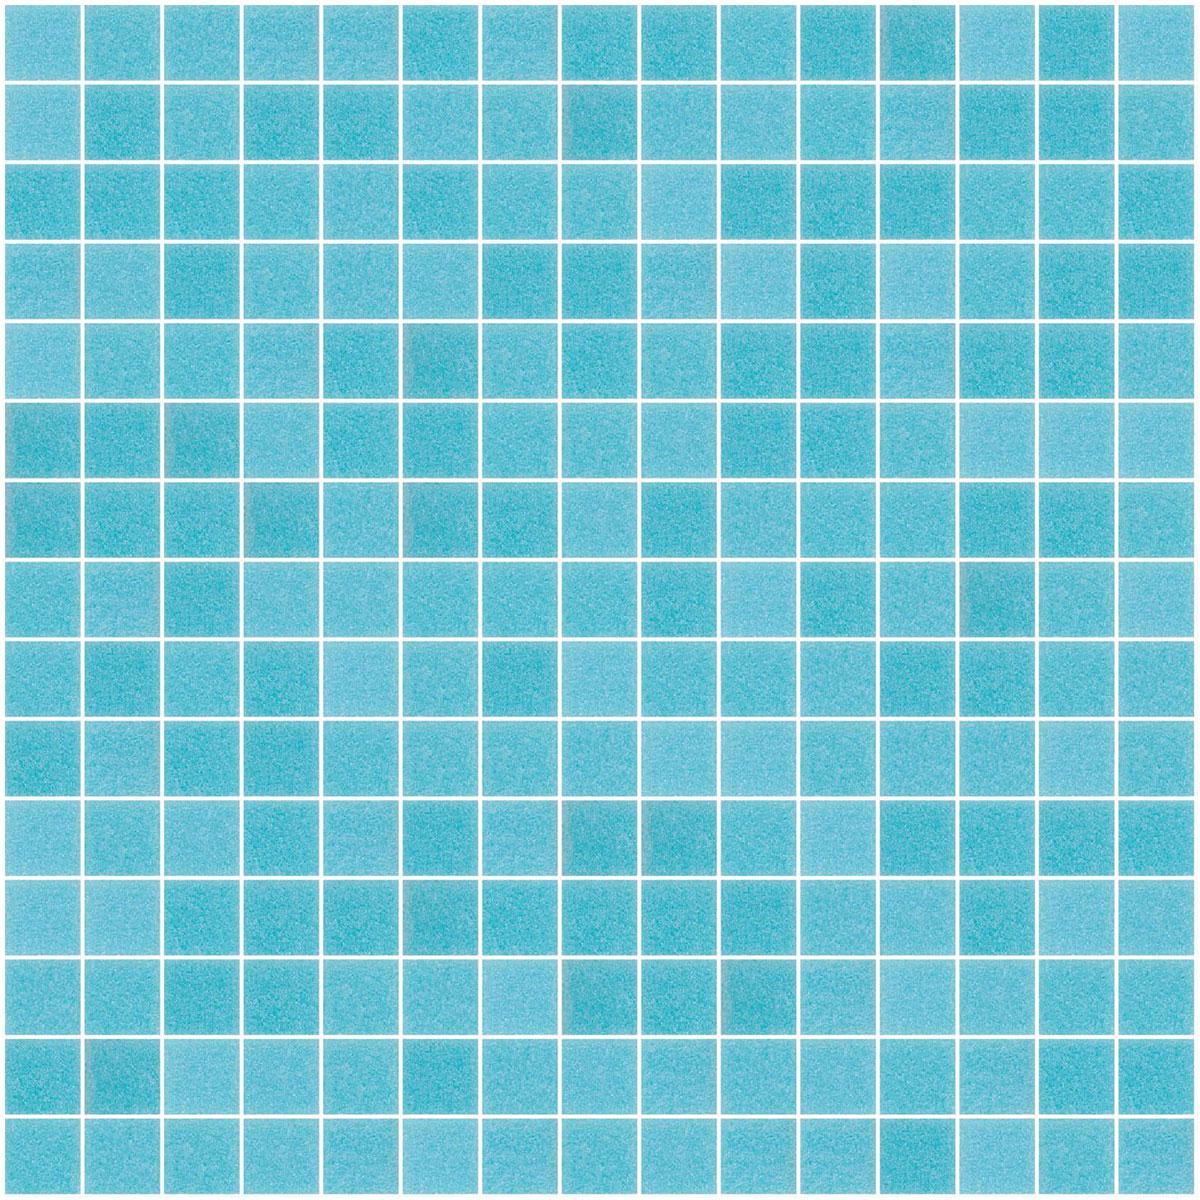 Vitreo - 122 Light Blue - mosaic feature pool tiles - Stone3 Brisbane